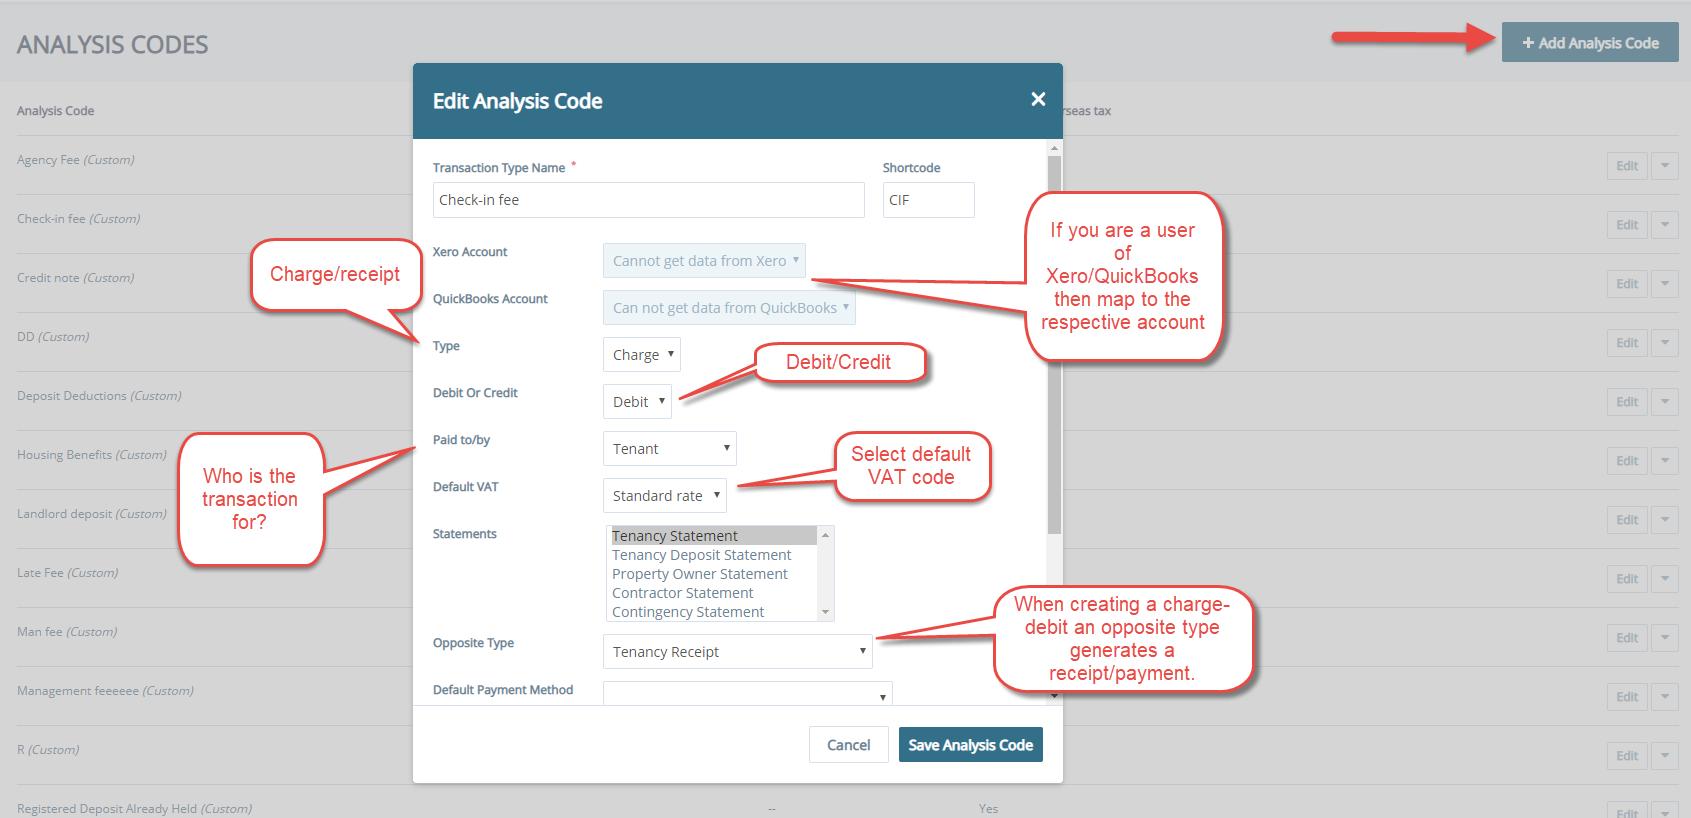 How to Set-up Custom Analysis Codes - Arthur Online